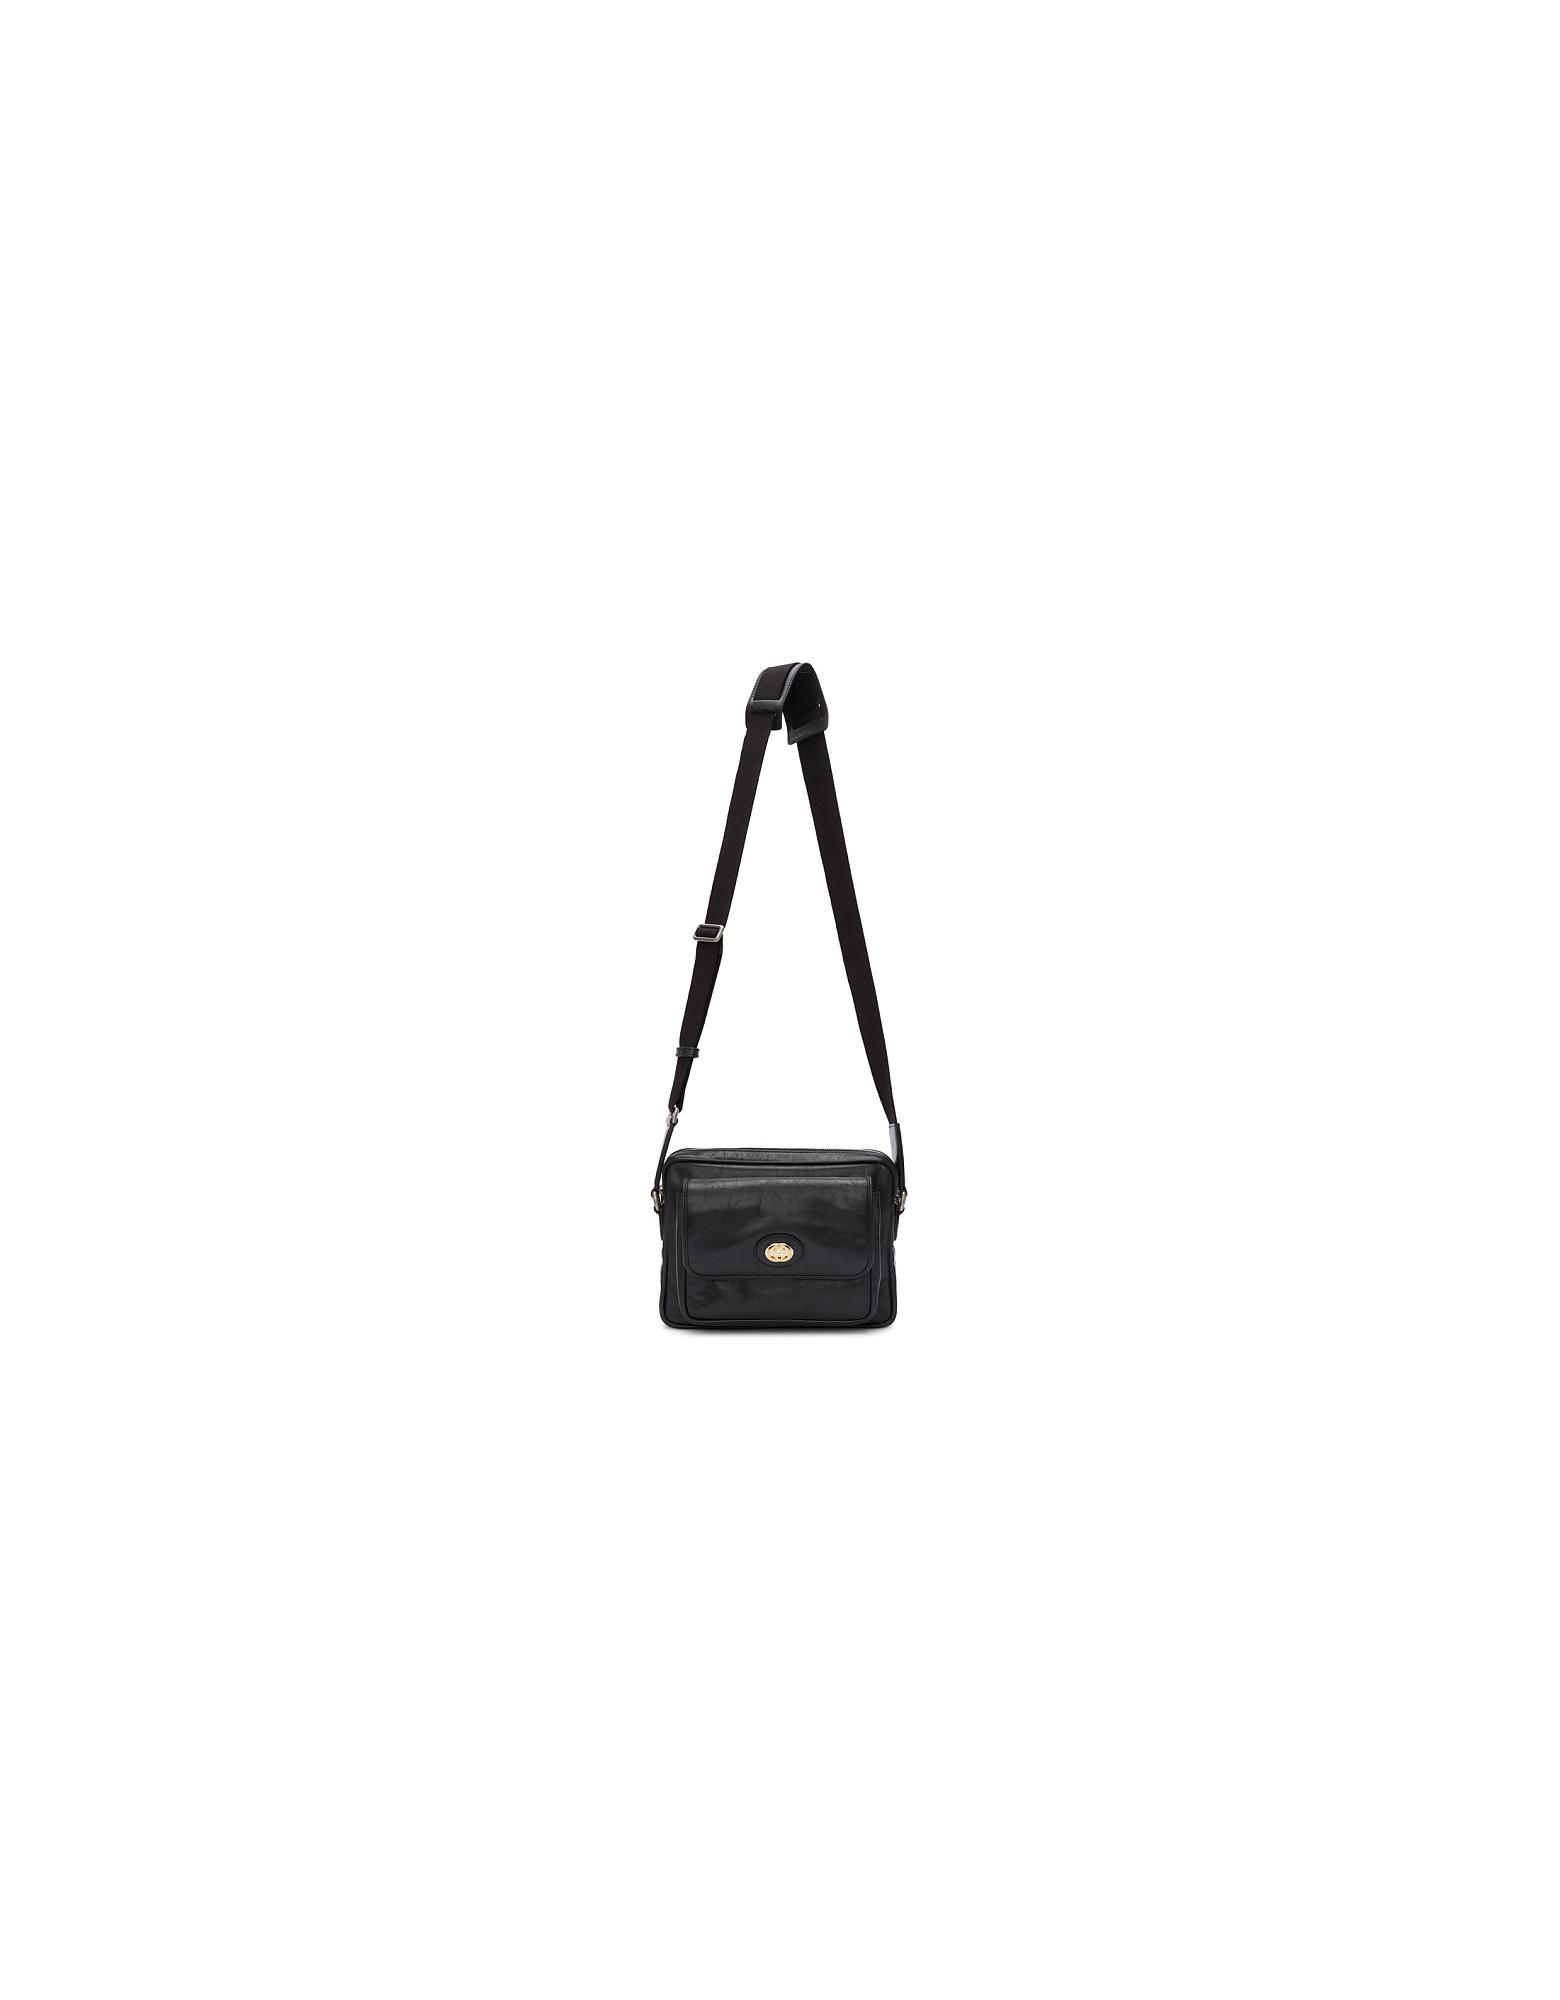 Gucci Designer Men's Bags, Black Morpheus Bag